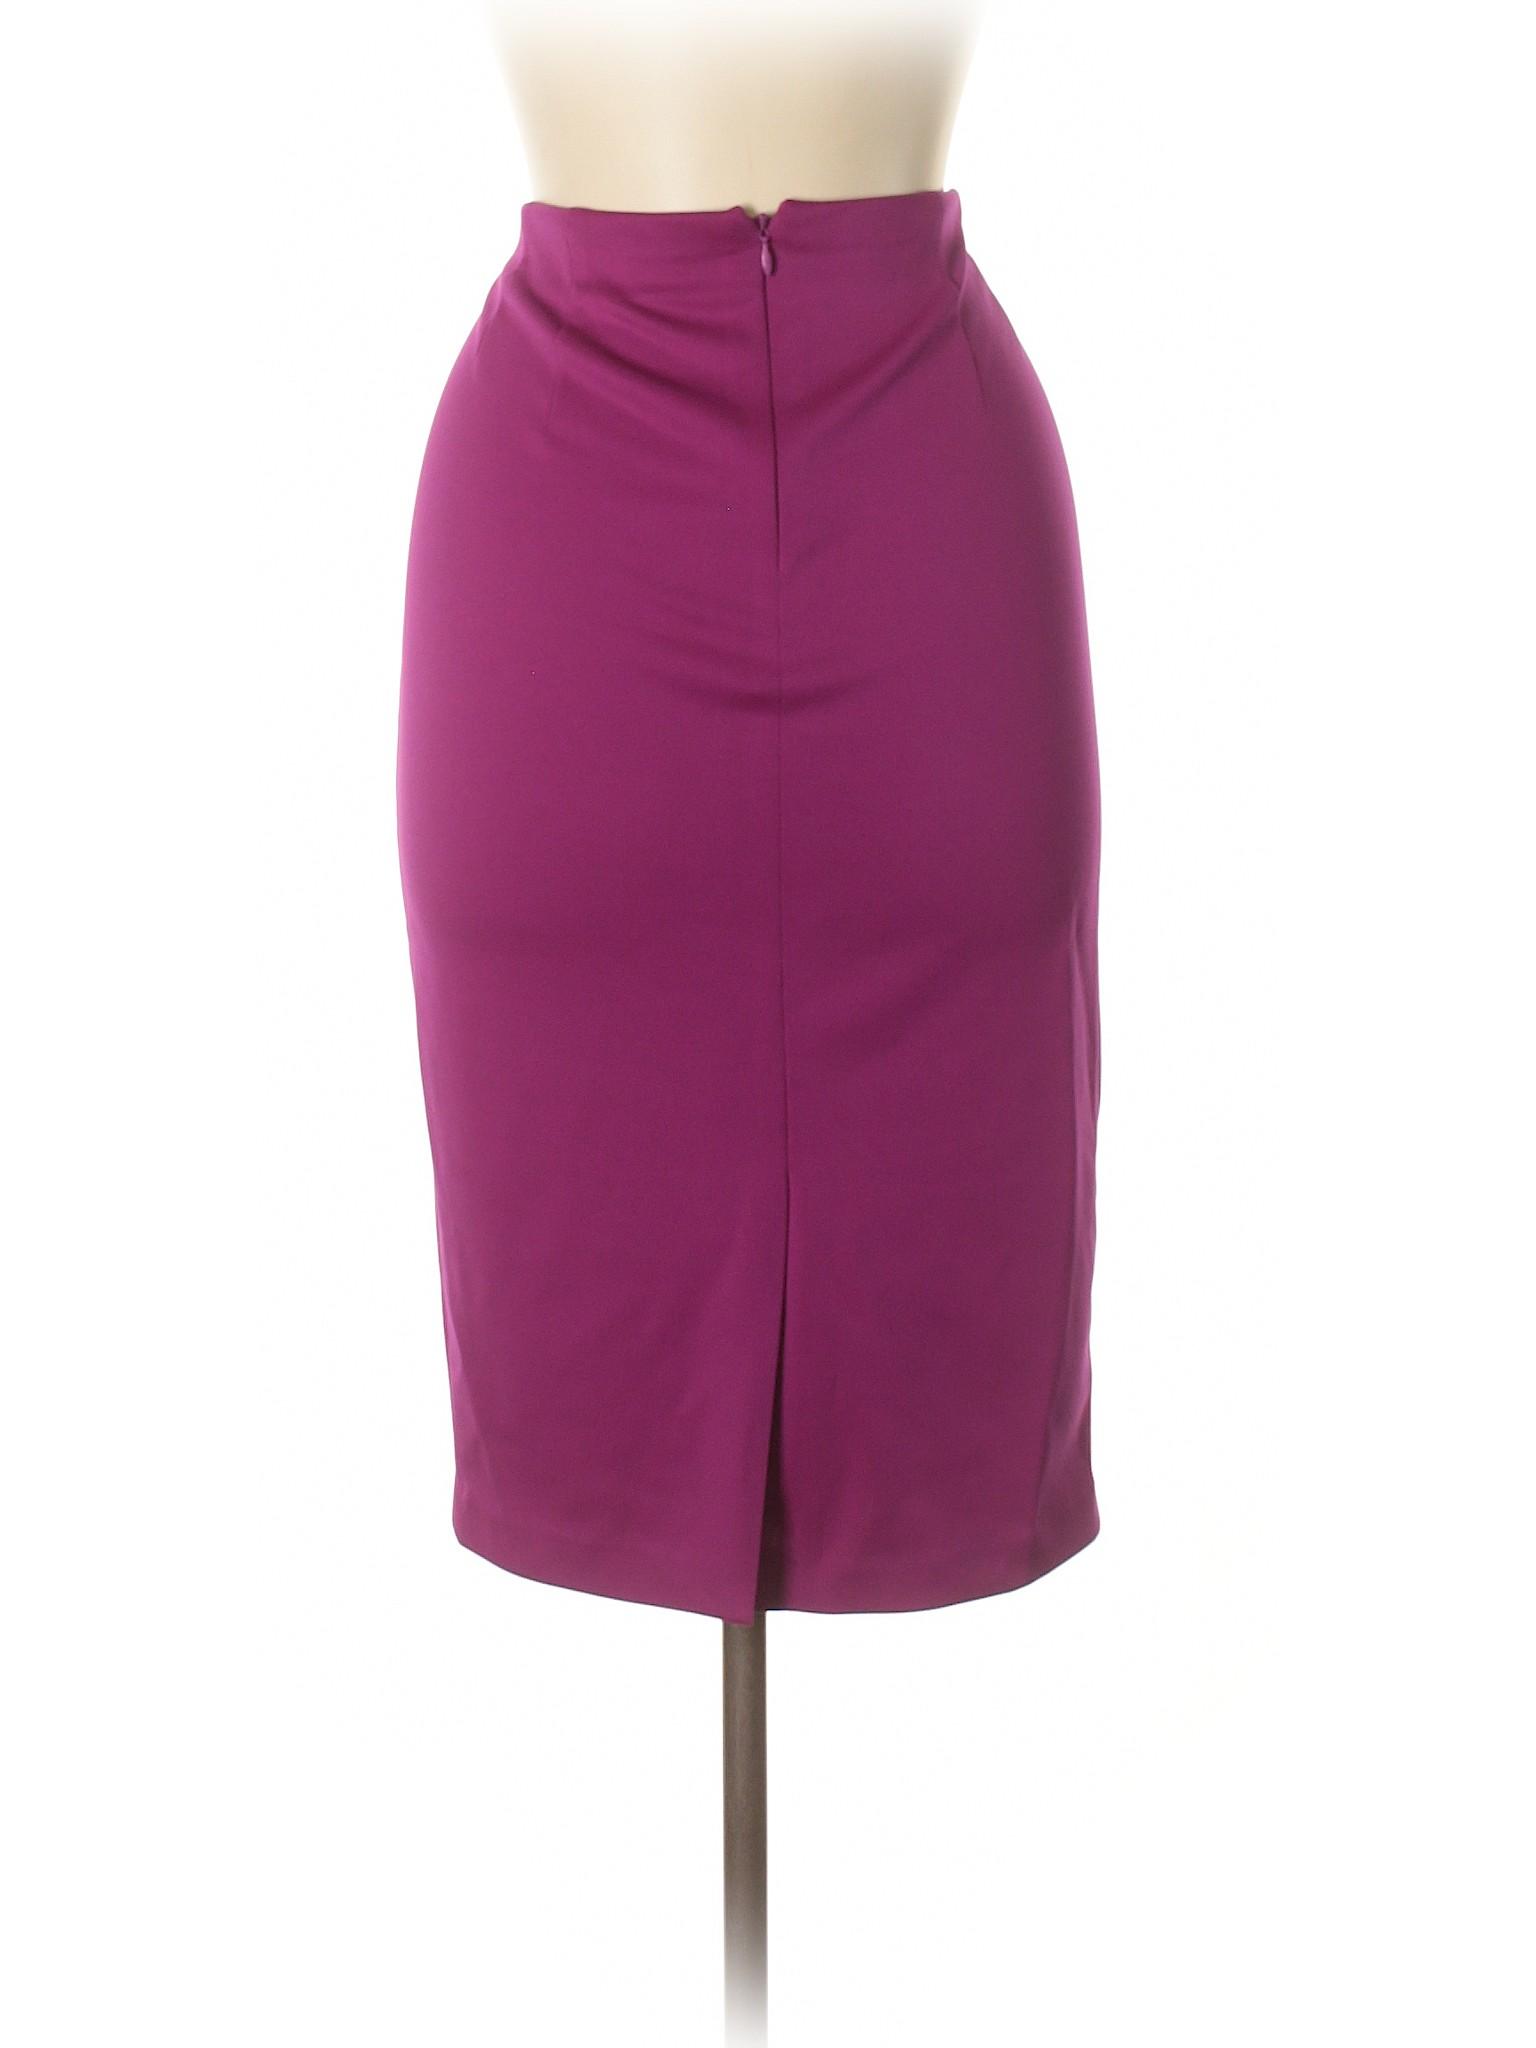 Casual Boutique Casual Skirt Boutique E0nX4qw4